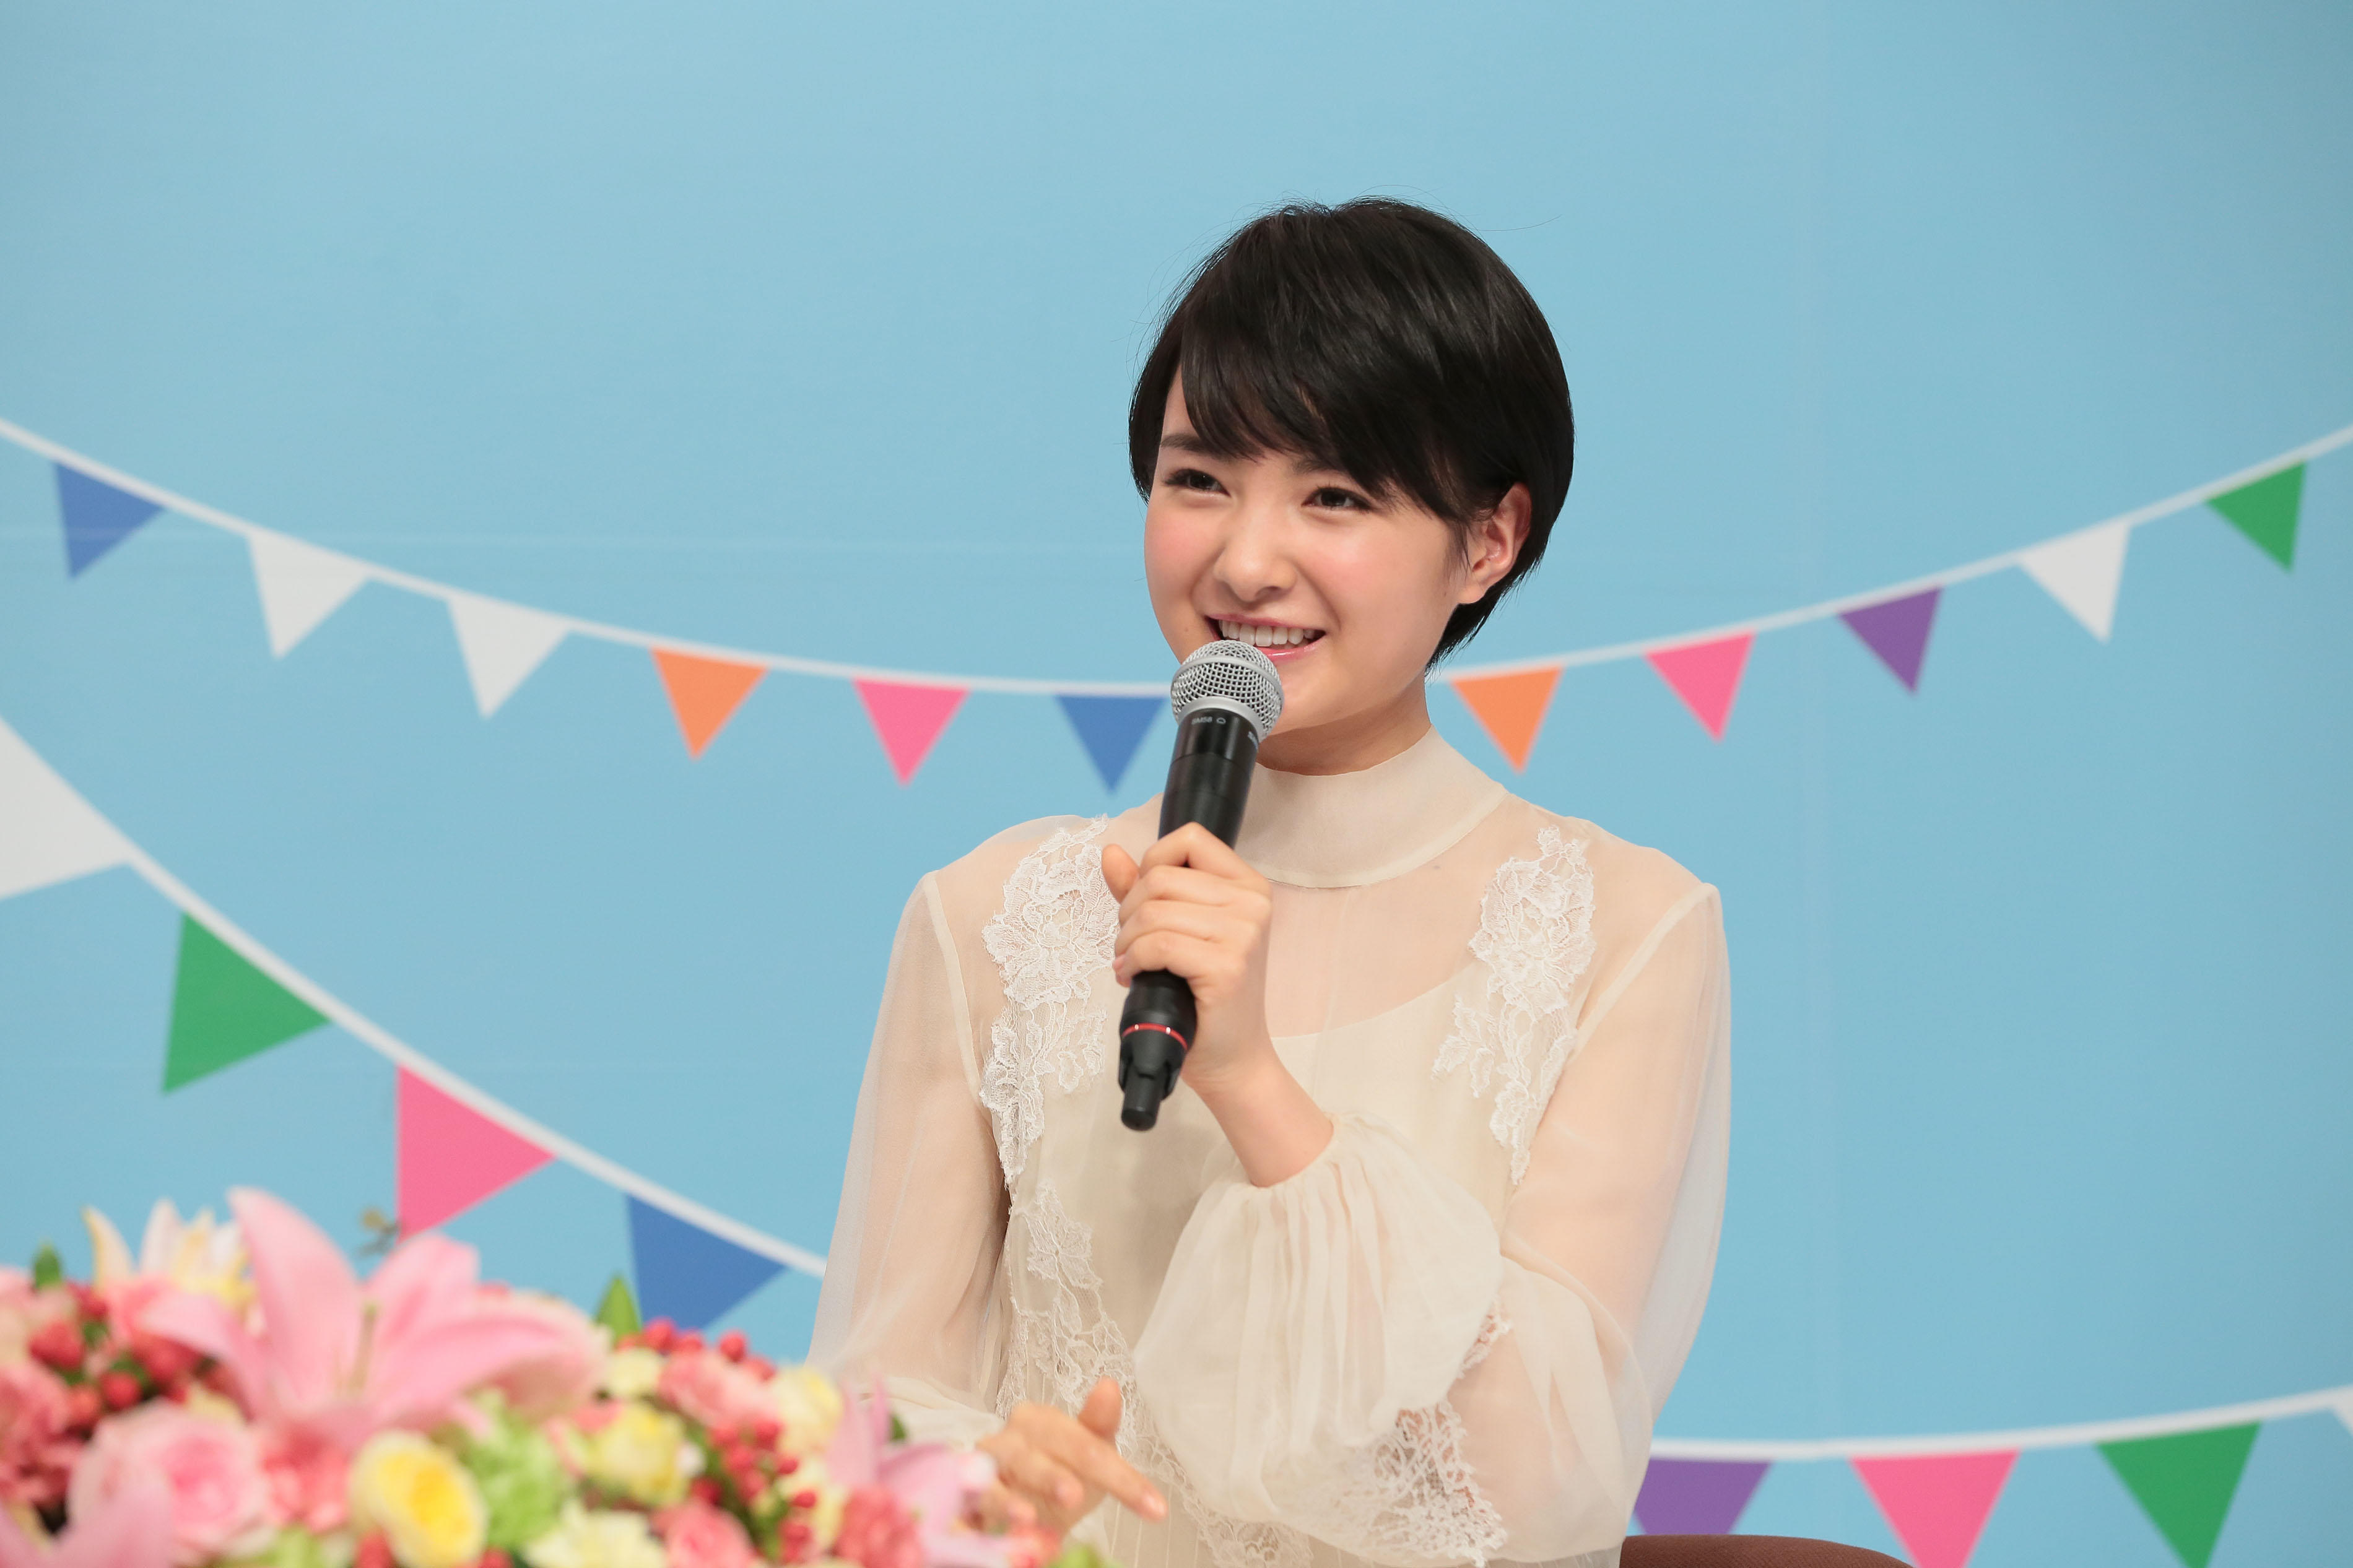 http://news.yoshimoto.co.jp/20170309224411-78234de1d4d6a81965b30b6d6374632cb1f45797.jpg